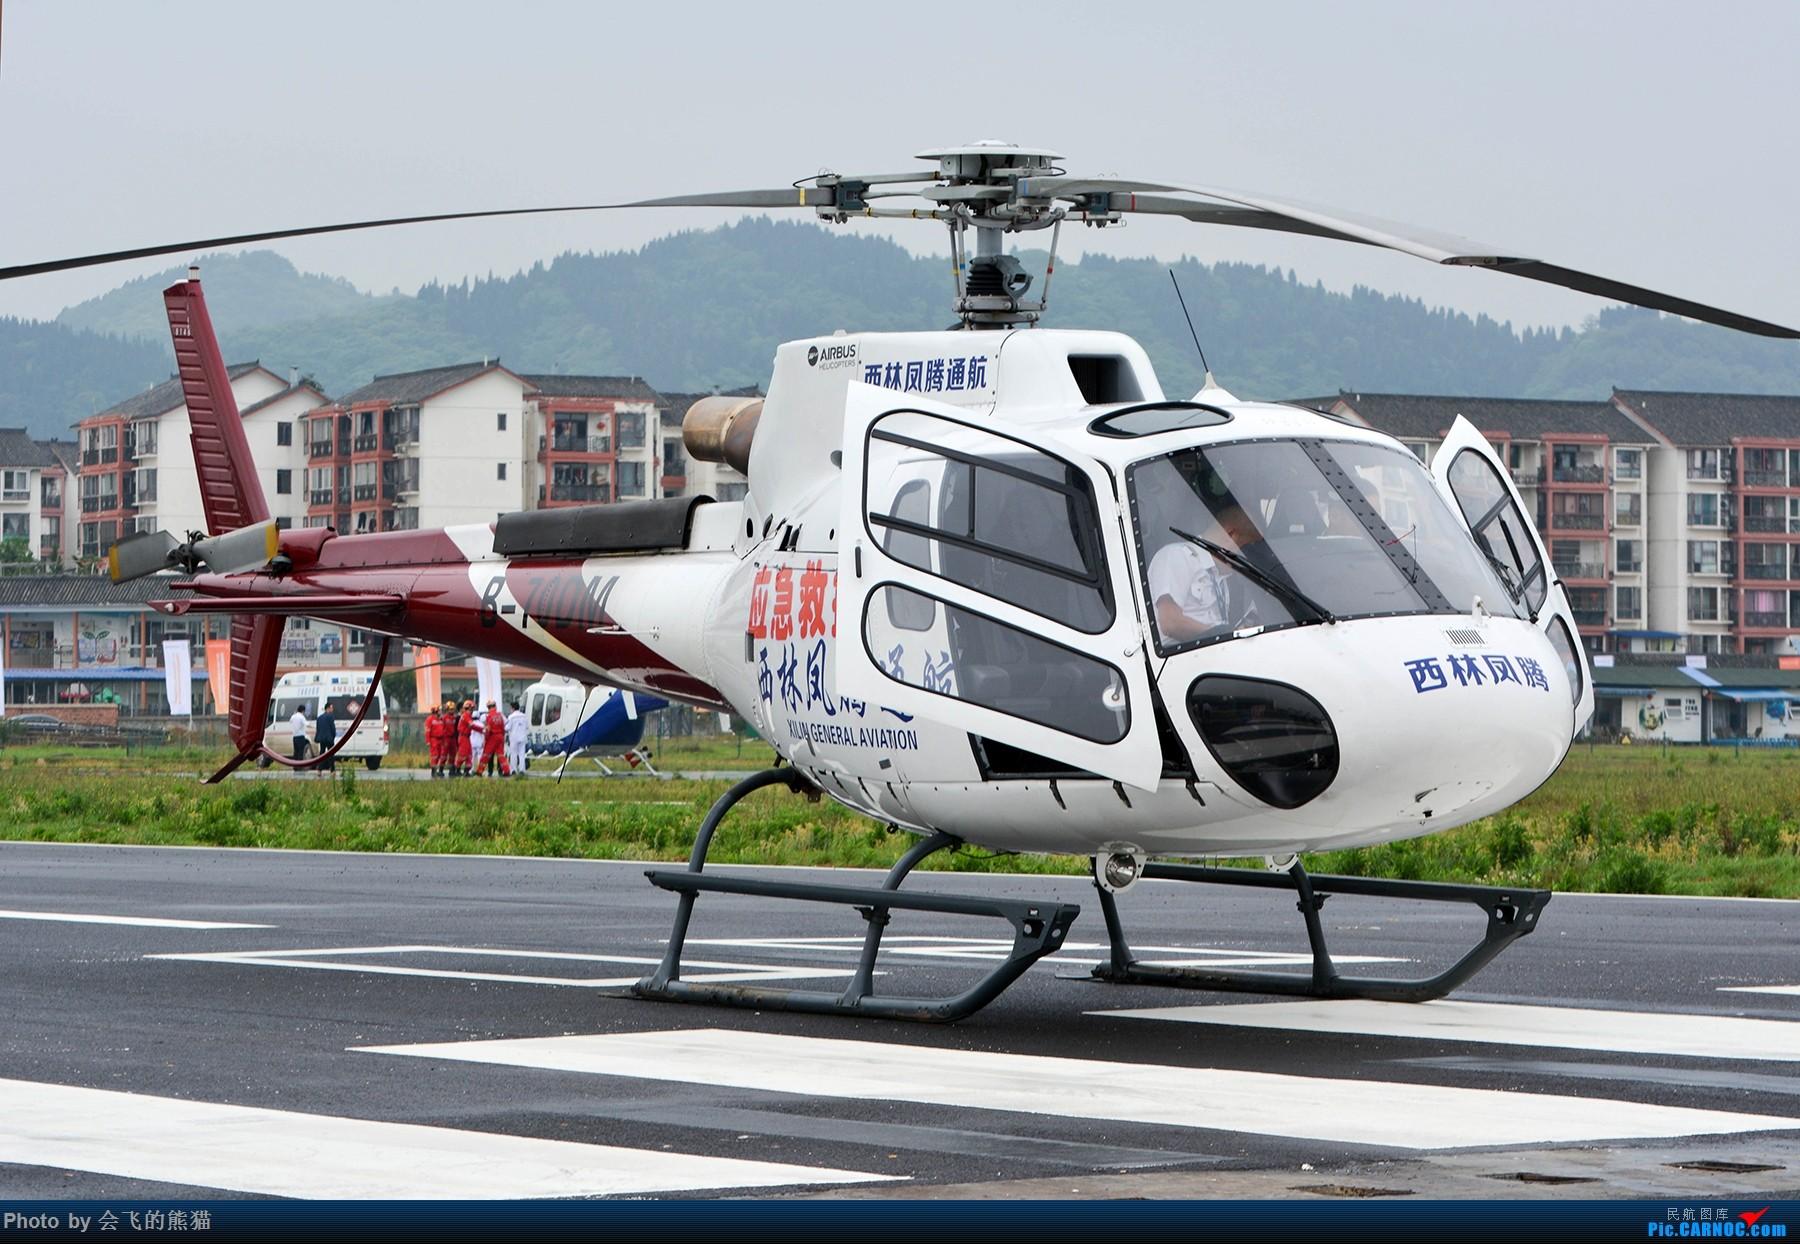 Re:[原创]本地小航展 EUROCOPTER AS350B3 B-70DM 驼峰通航洛带机场